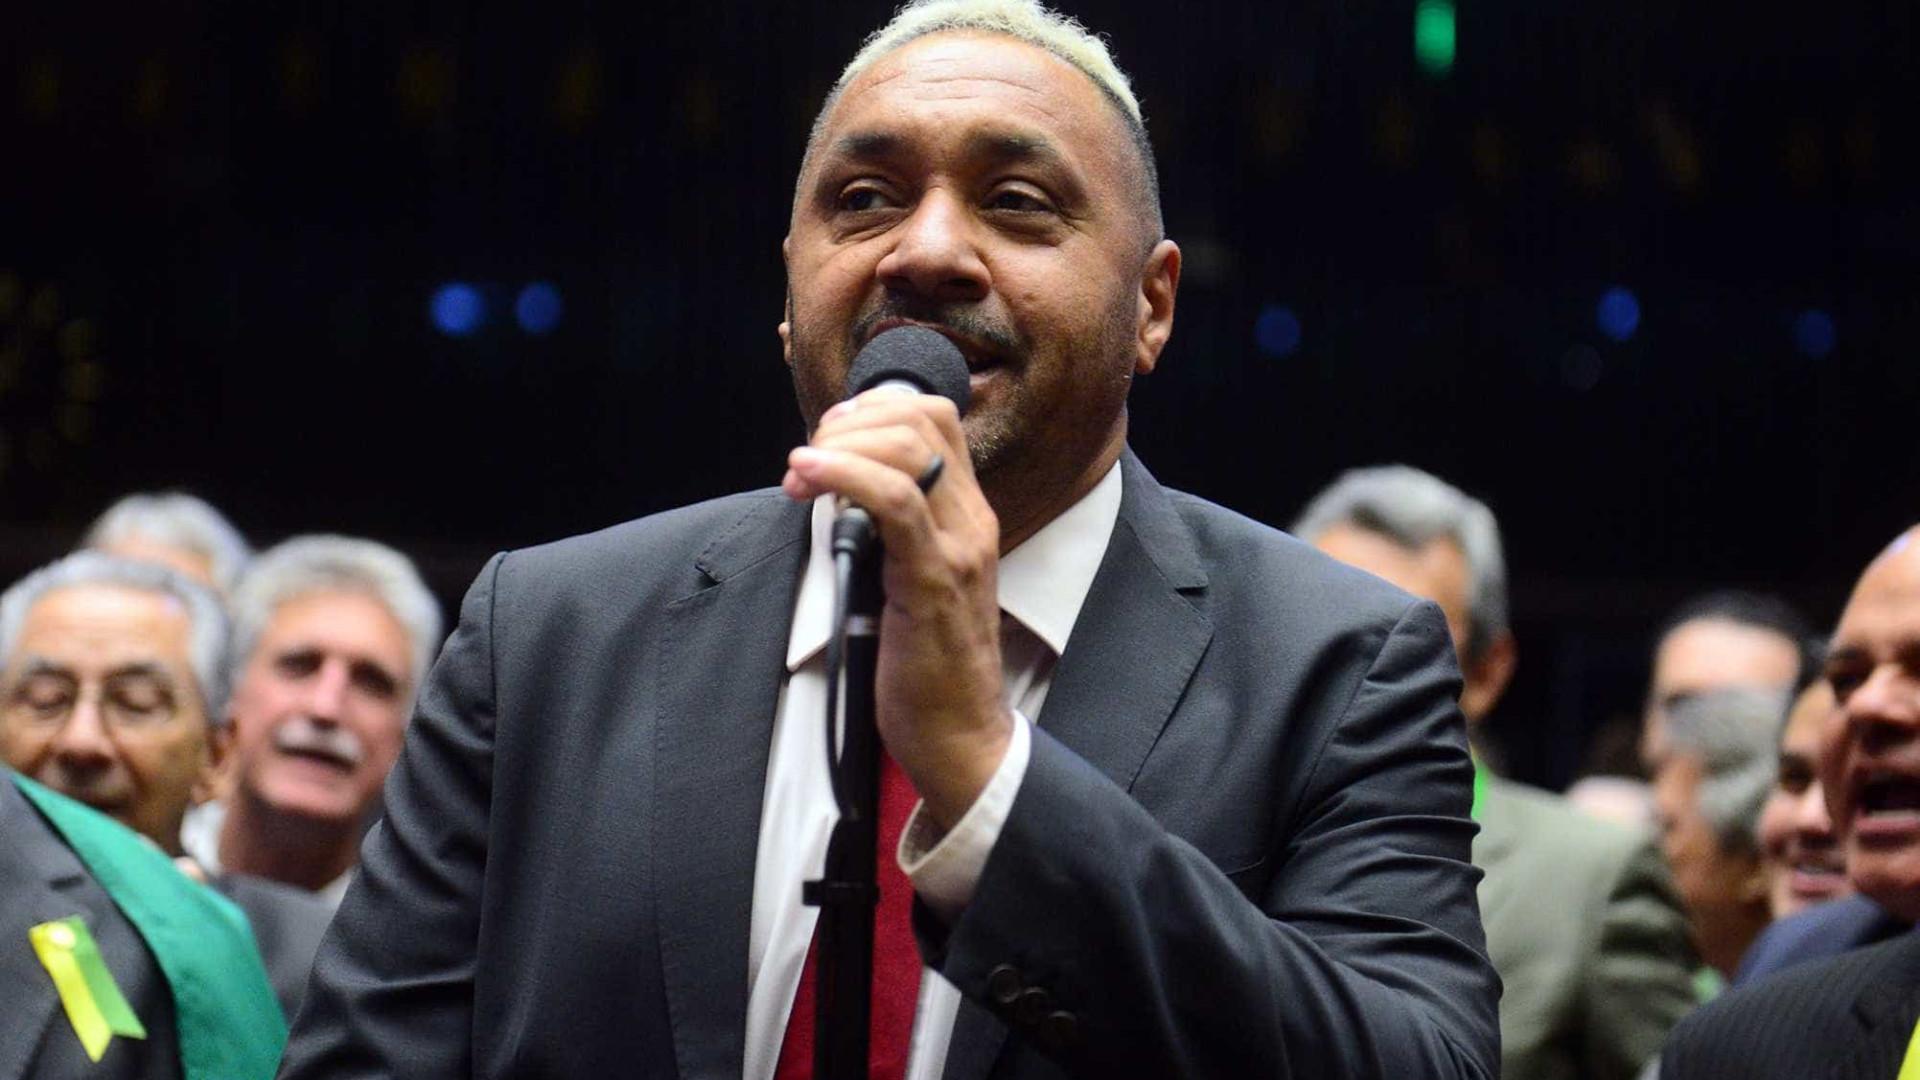 'Se não sair do pedestal, Bolsonaro será pior presidente', diz Tiririca